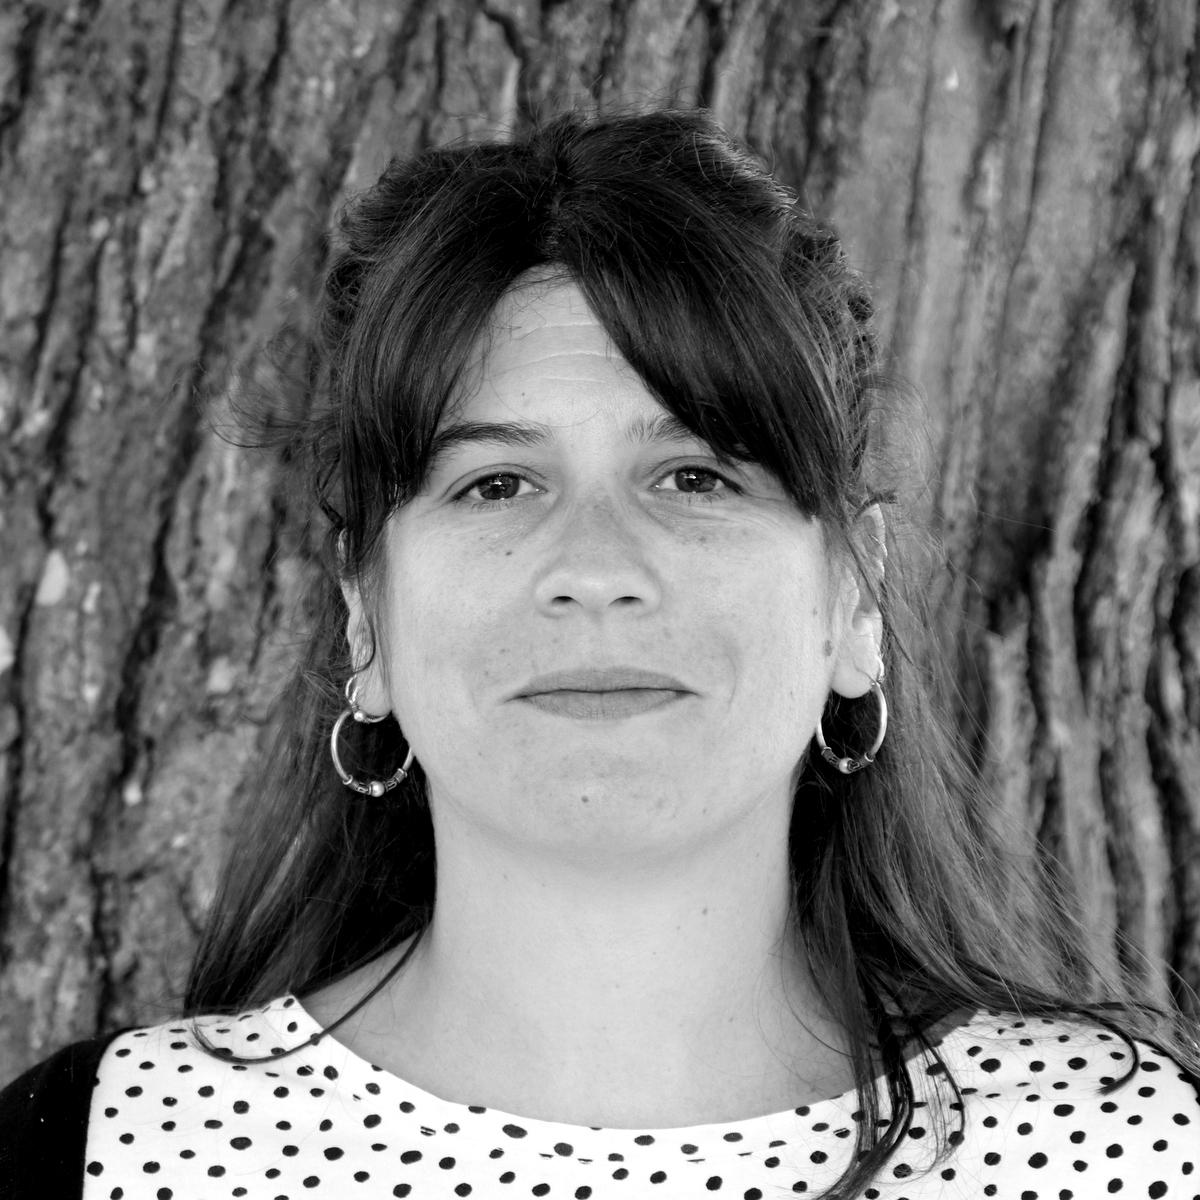 Maia Etchandy